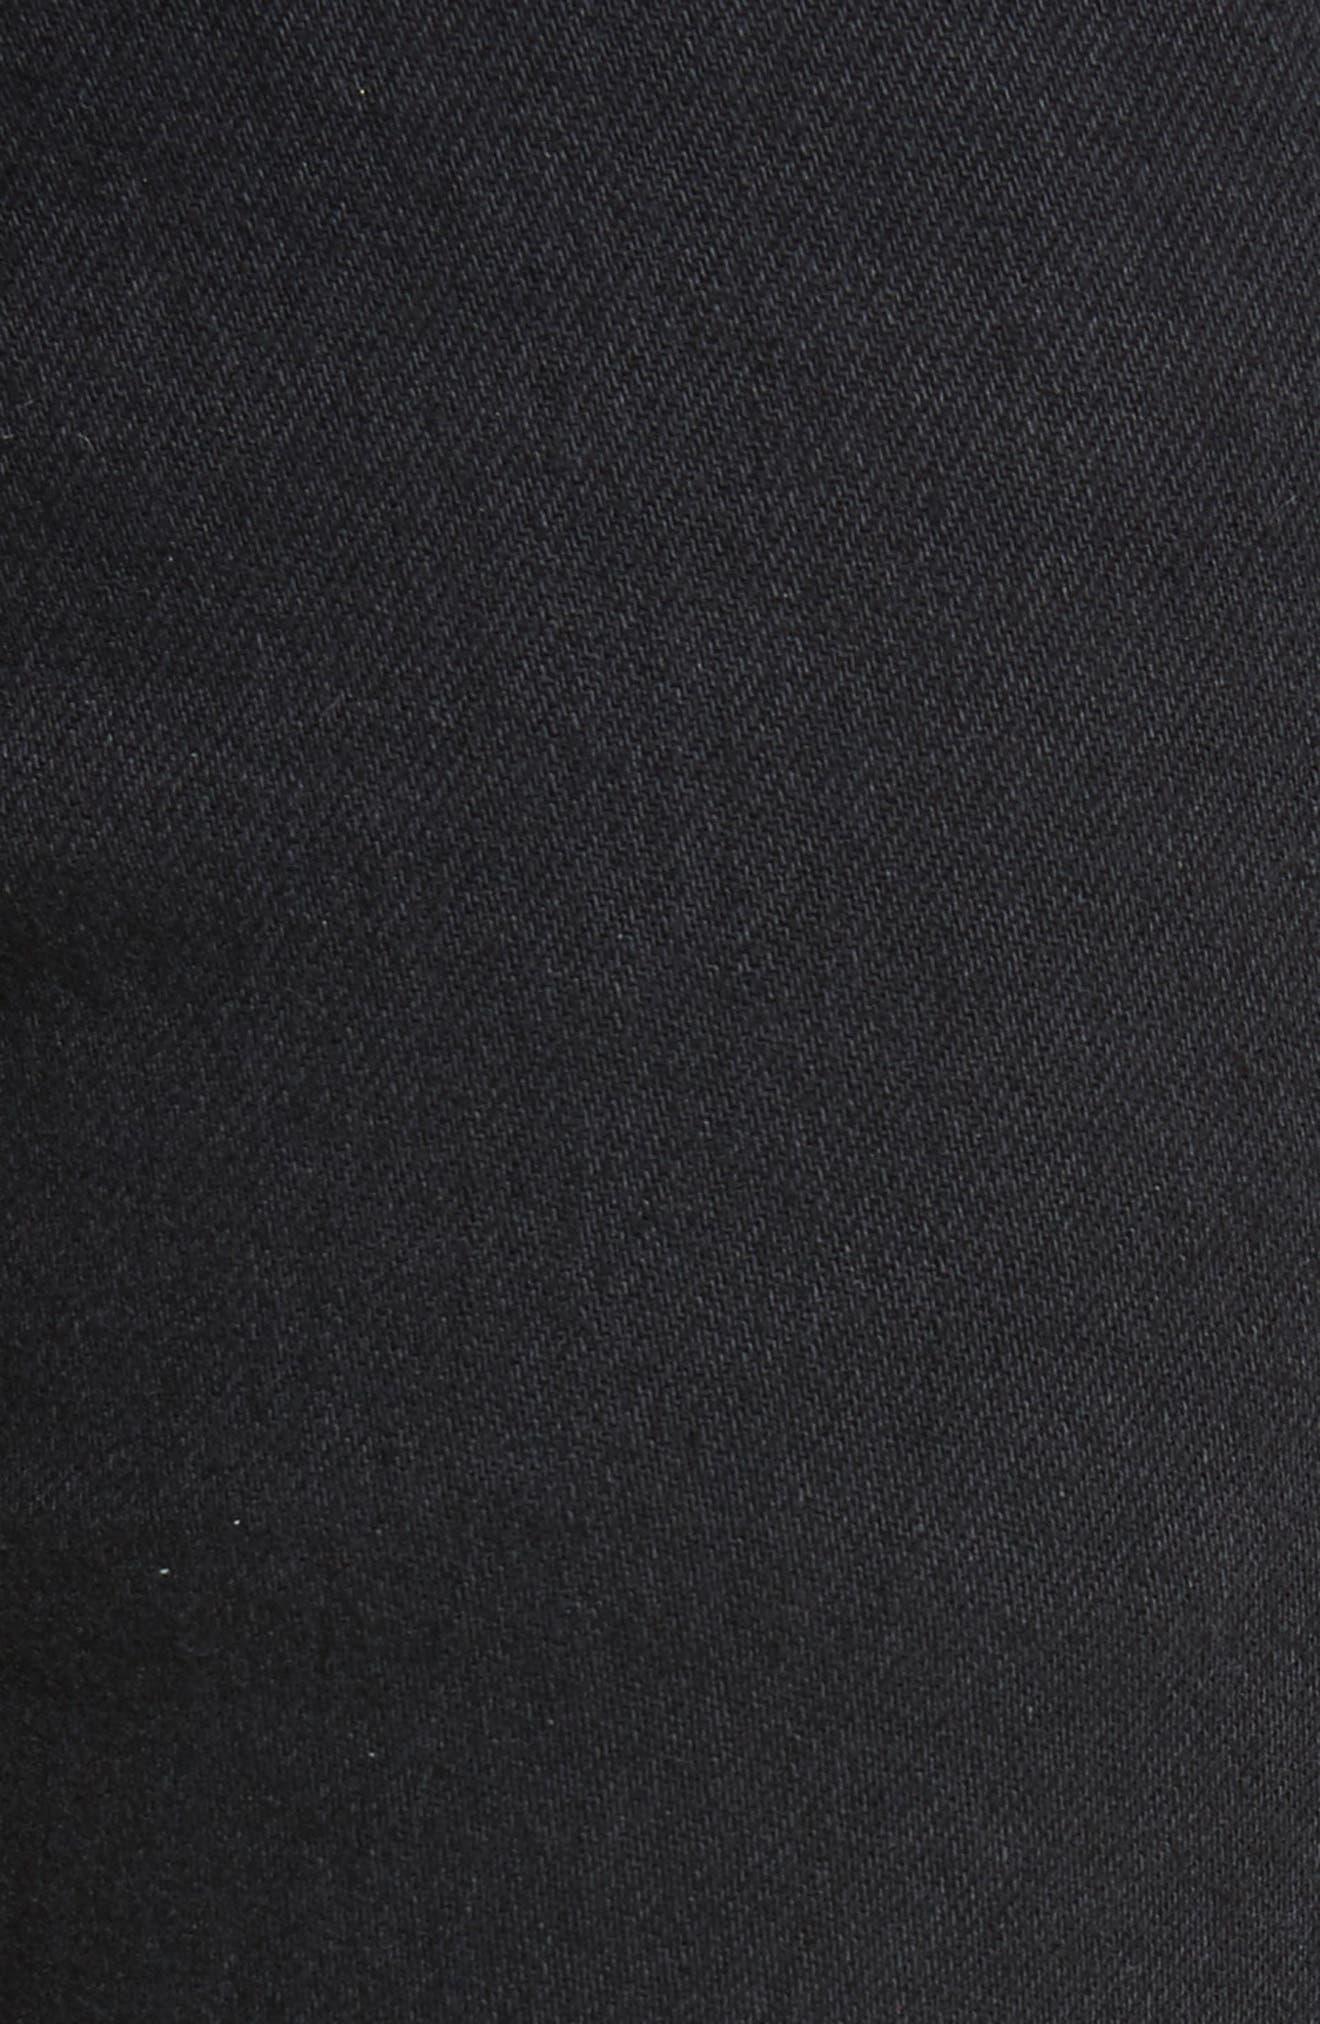 Boyd High Rise Jeans,                             Alternate thumbnail 5, color,                             001